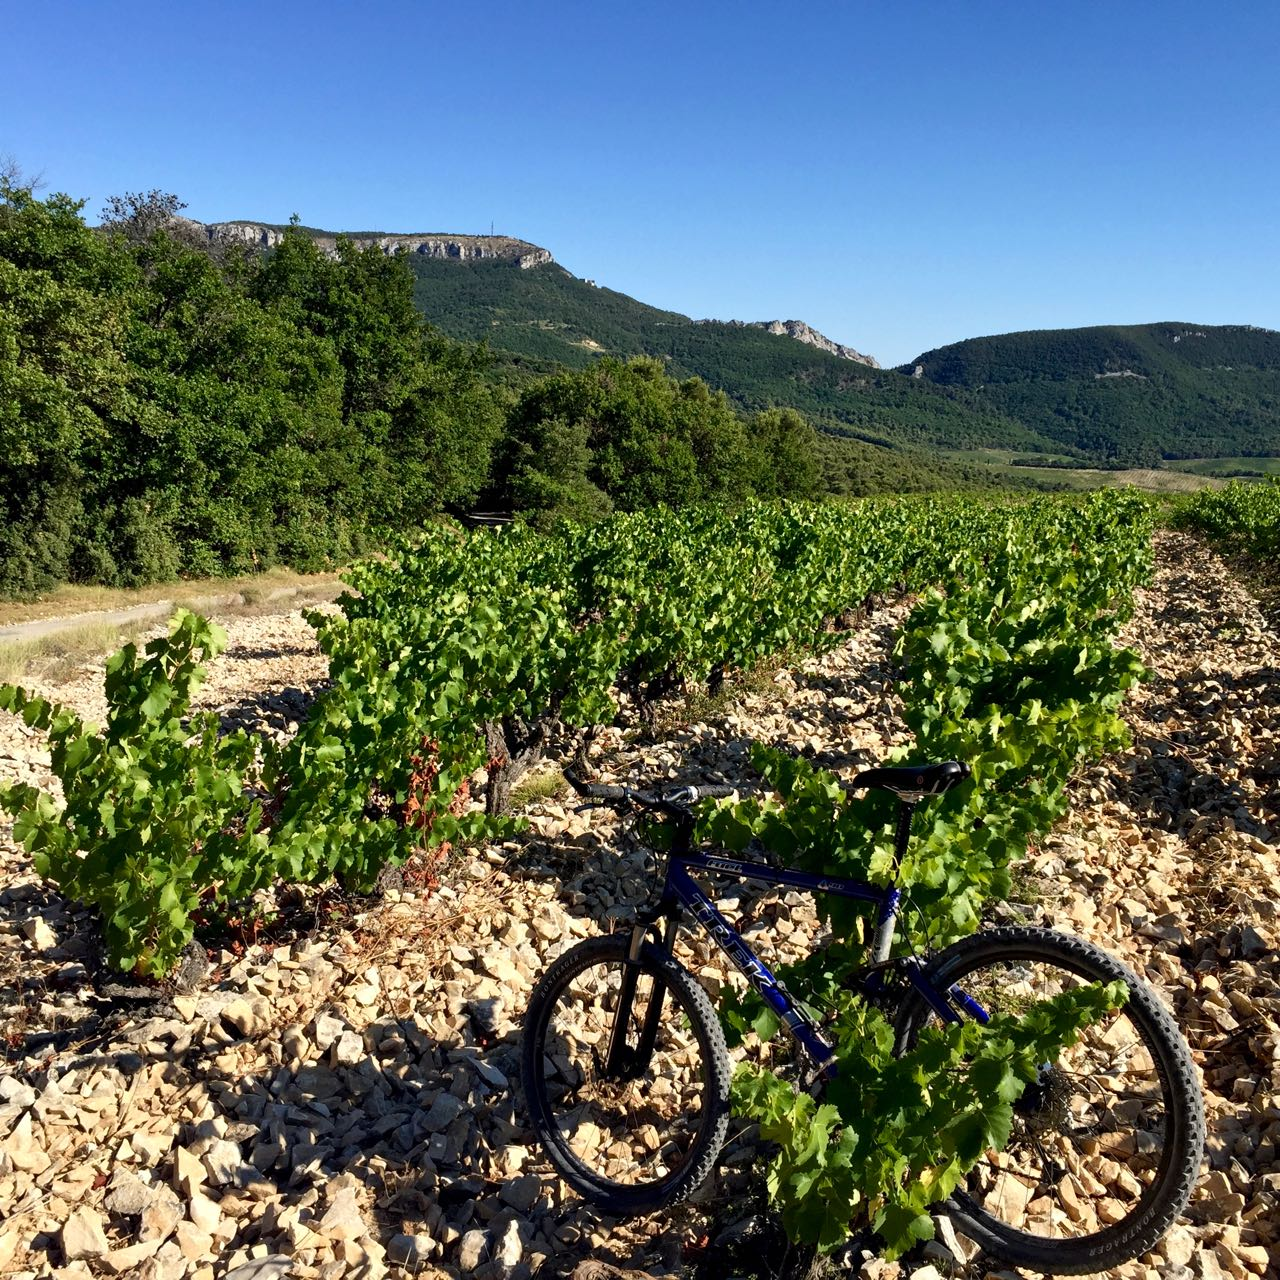 Cycling through the dentelles de Montmirail